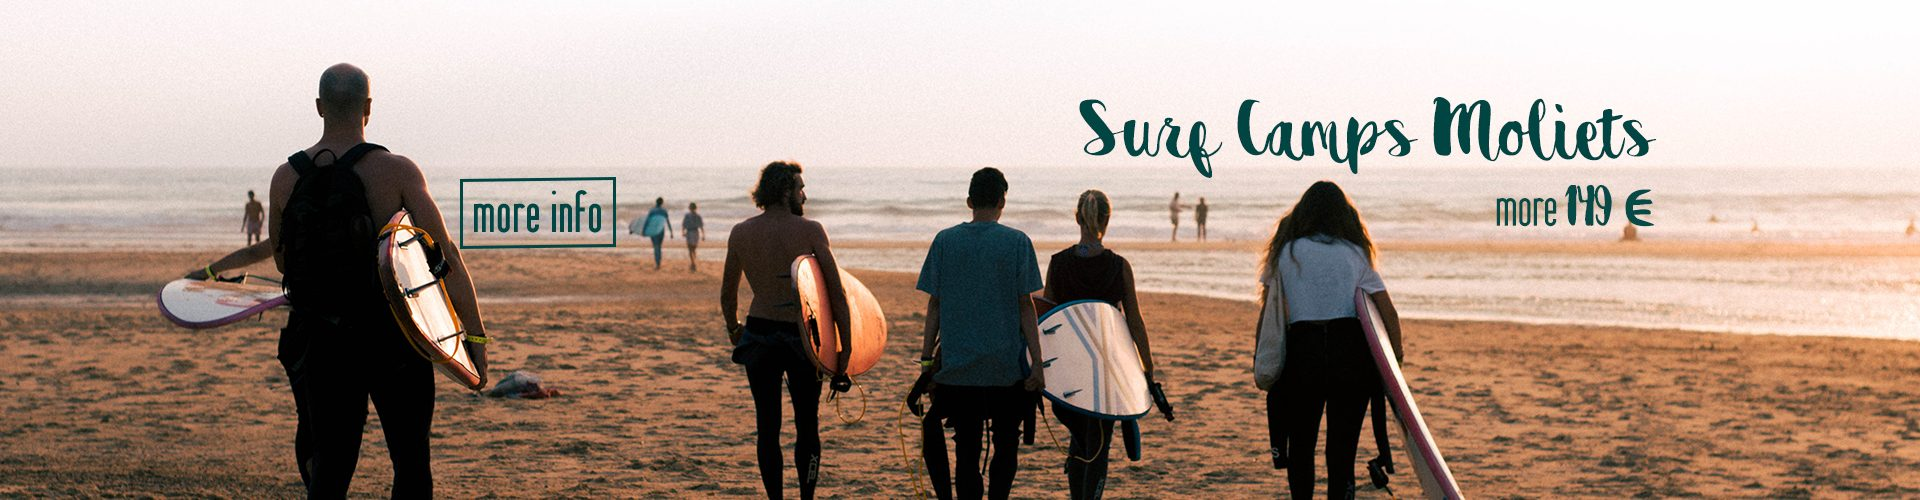 Surf Camps Moliets